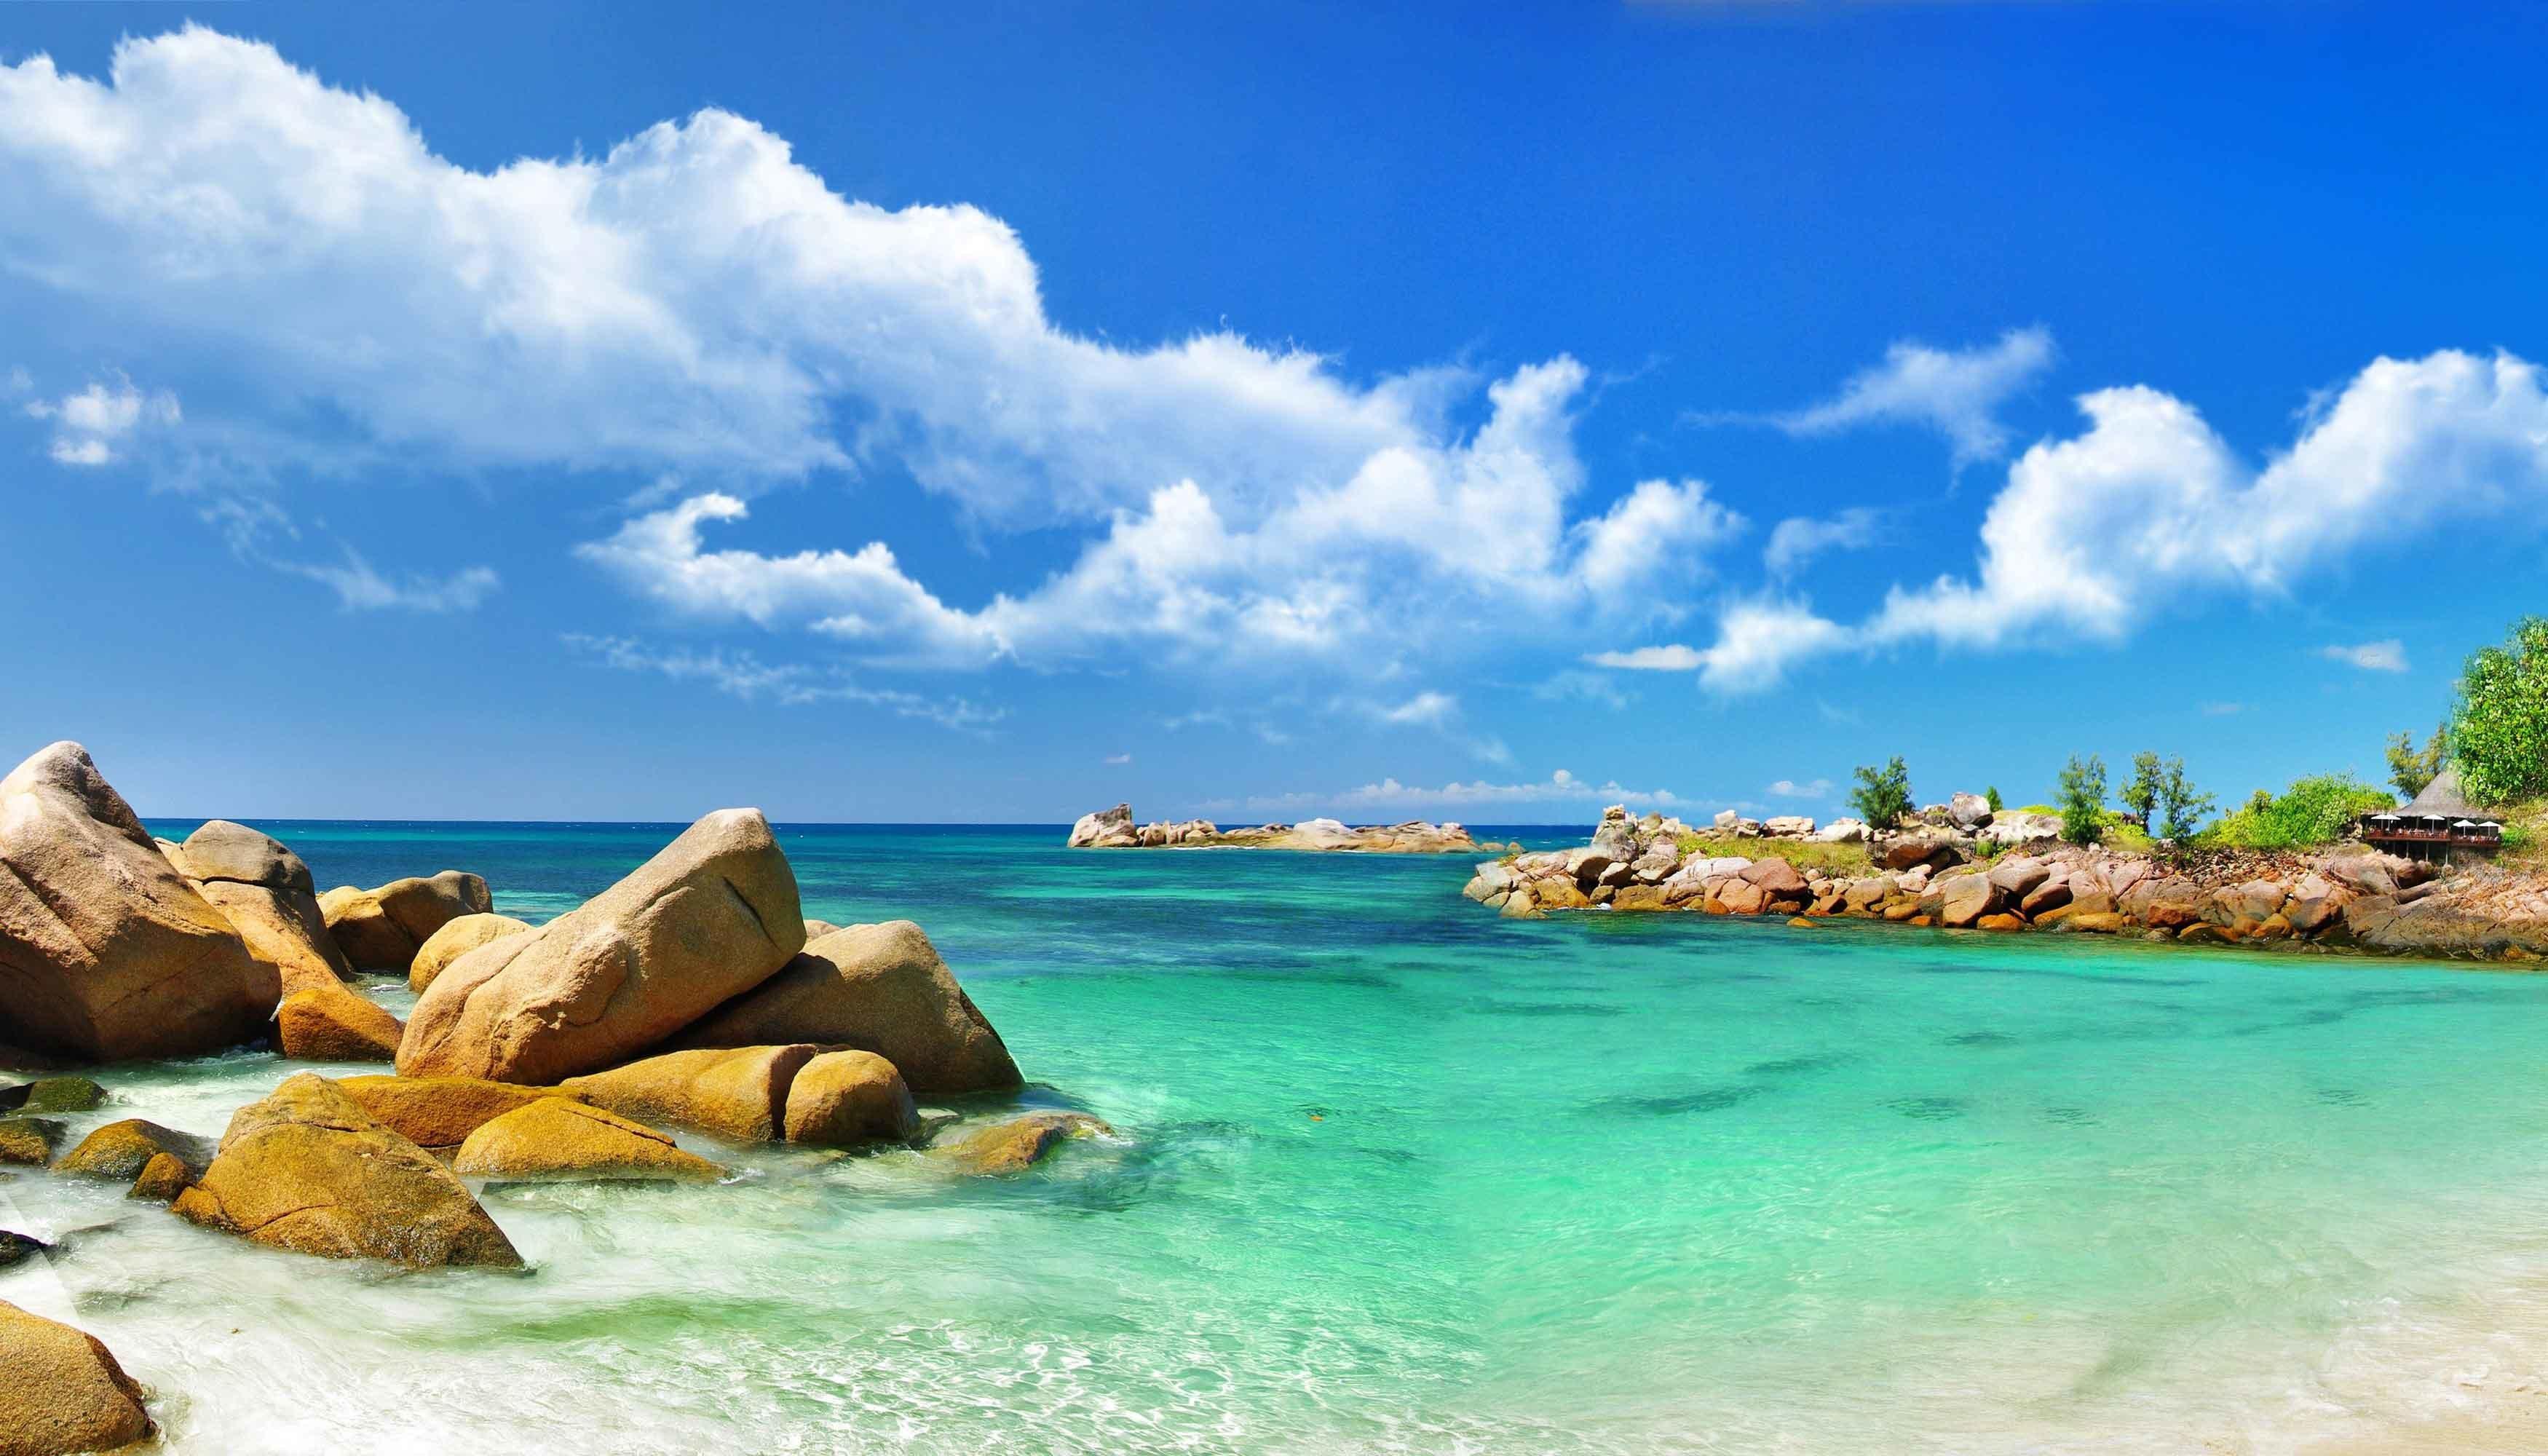 Sea Ocean Clouds Stones Nature Tropics Scenery Wallpapers - Windows Sea Desktop Backgrounds - HD Wallpaper